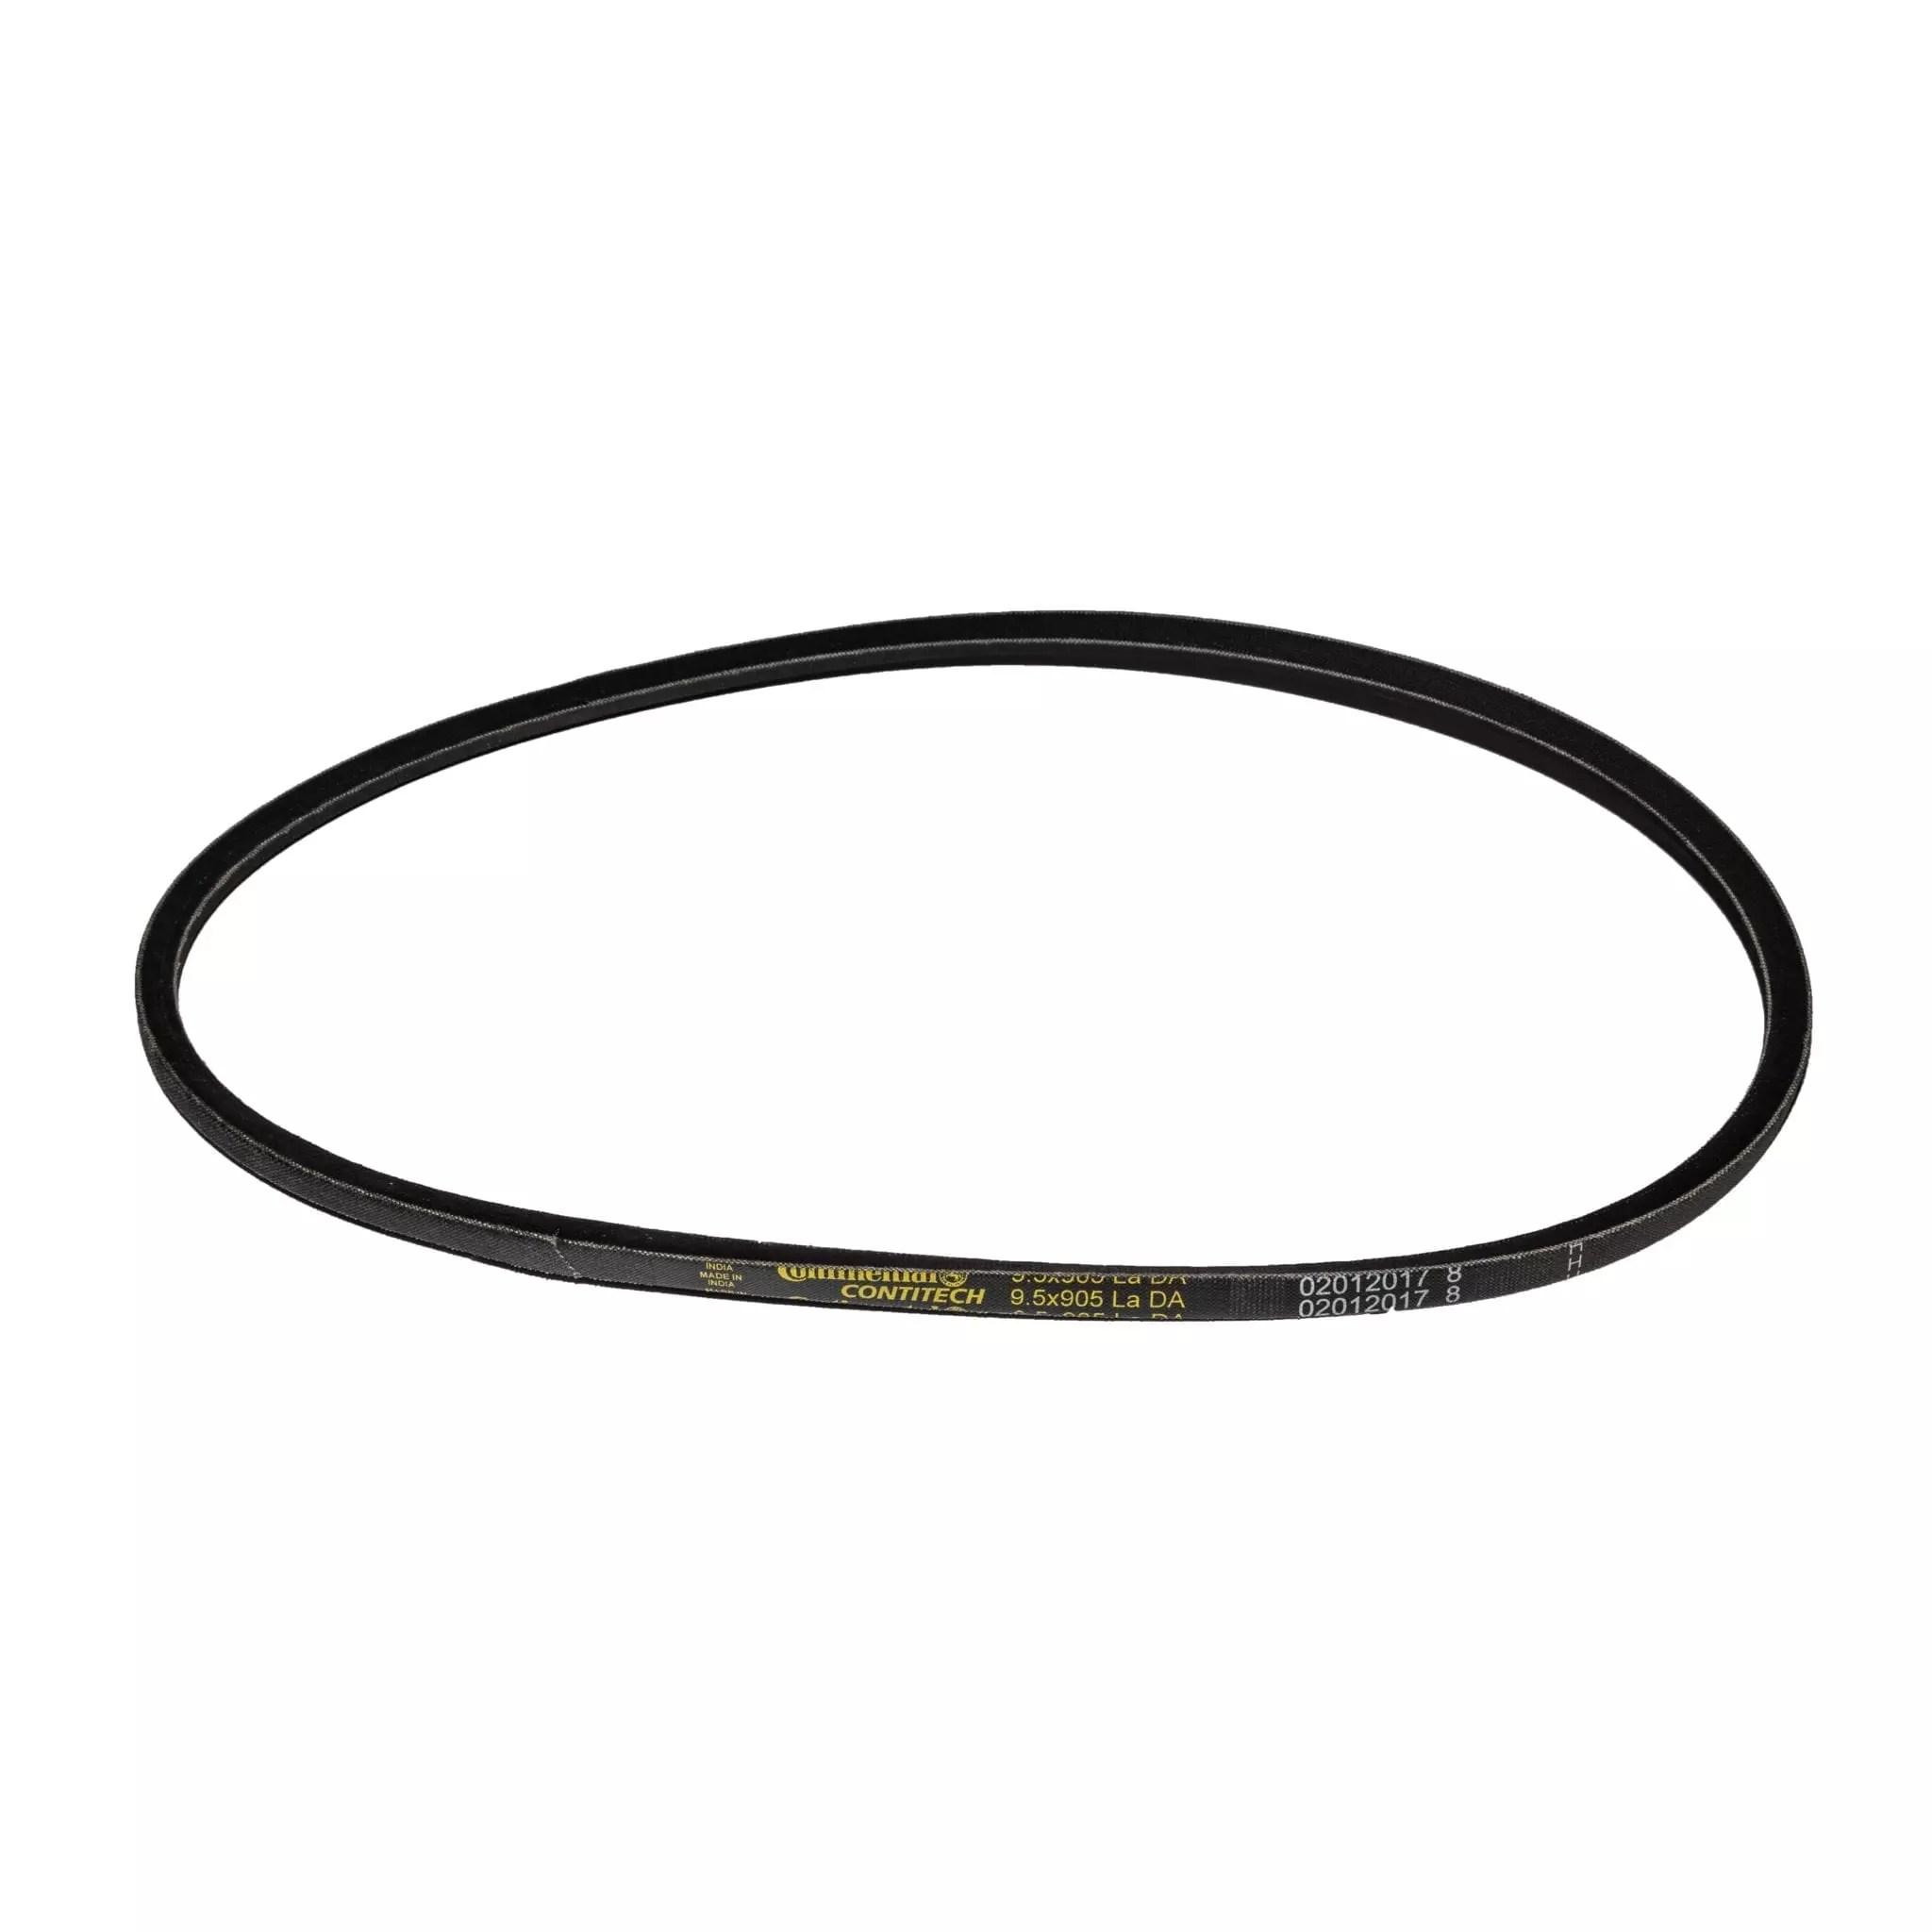 Vw Standard Diameter Pulley Belt